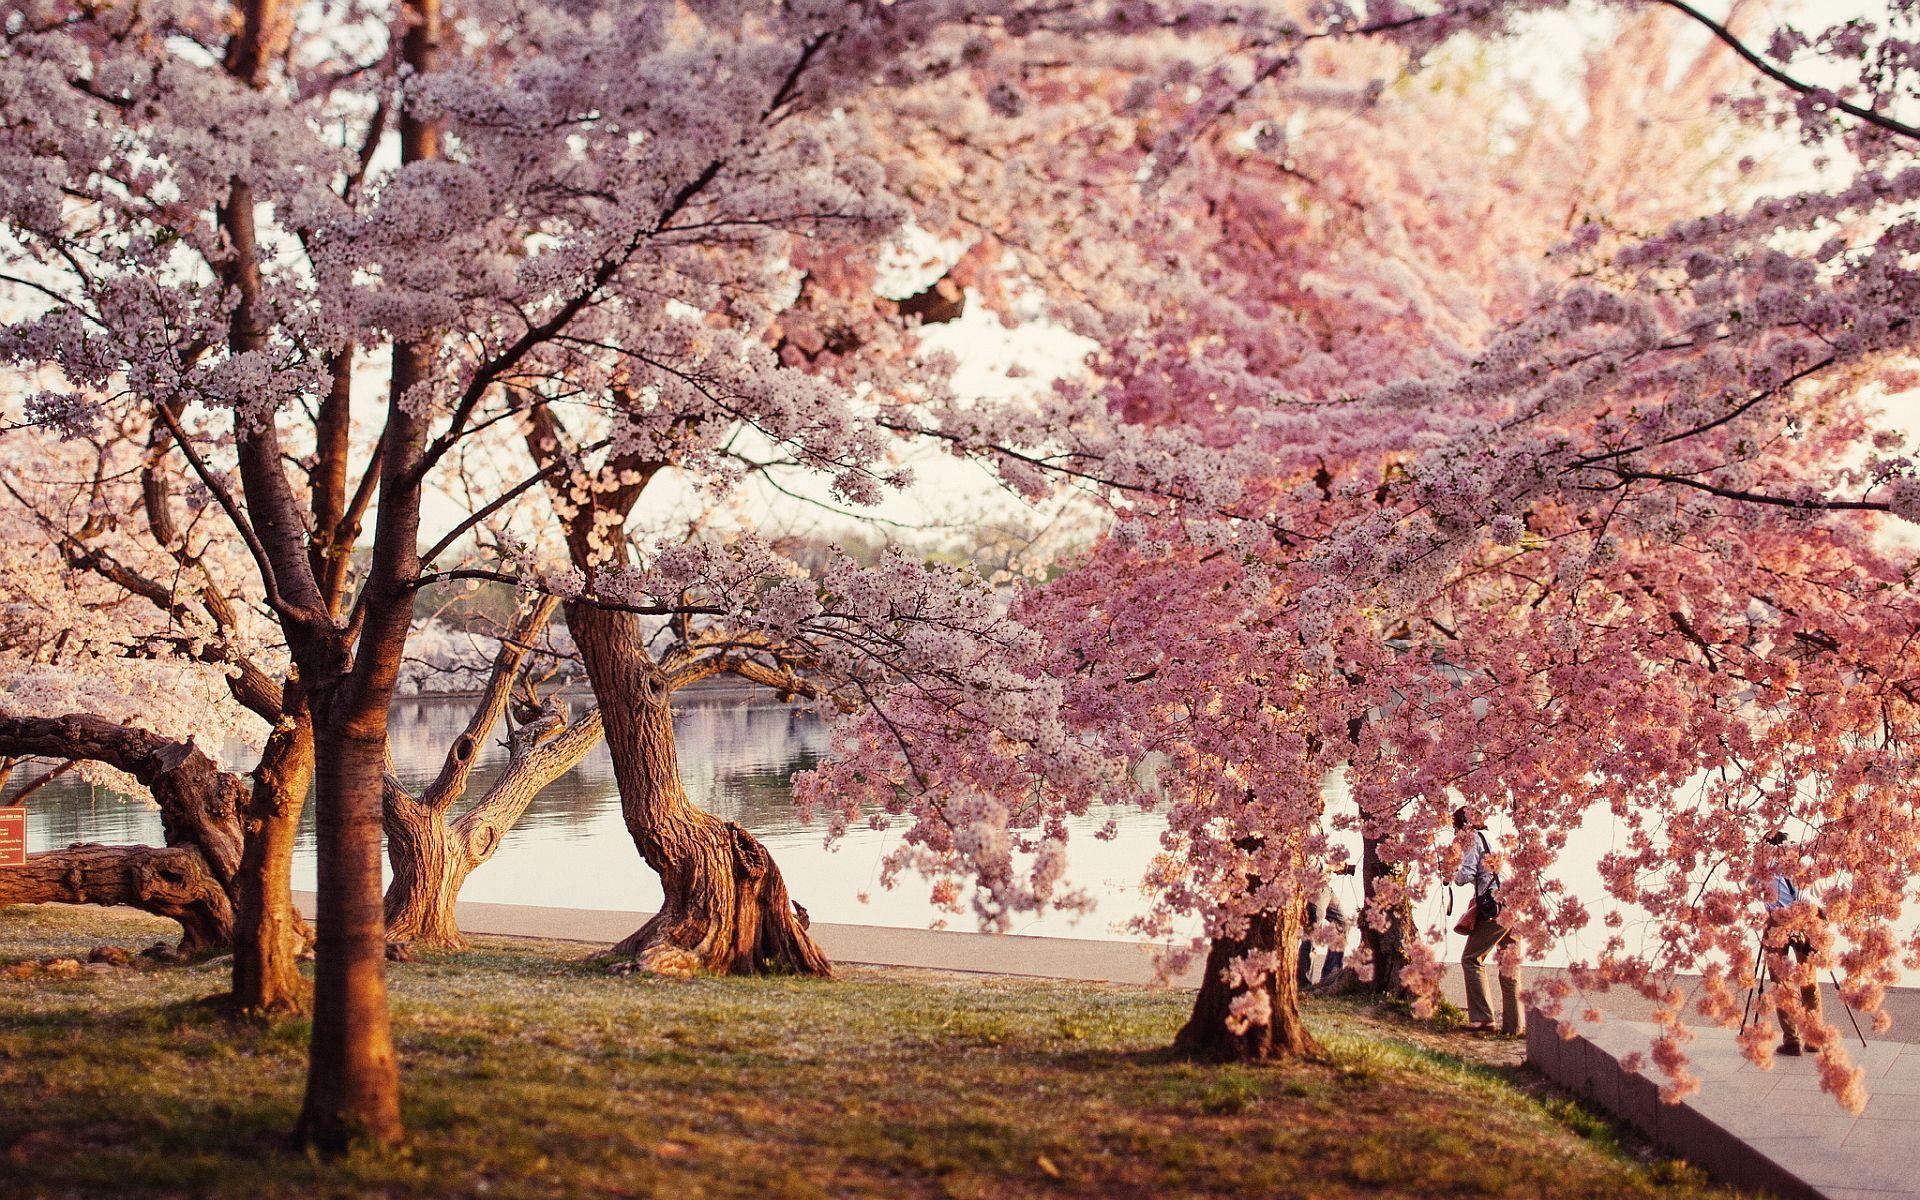 Cherry Blossoms Cherry Blossom Wallpaper Amazing Nature Photos Cherry Blossom